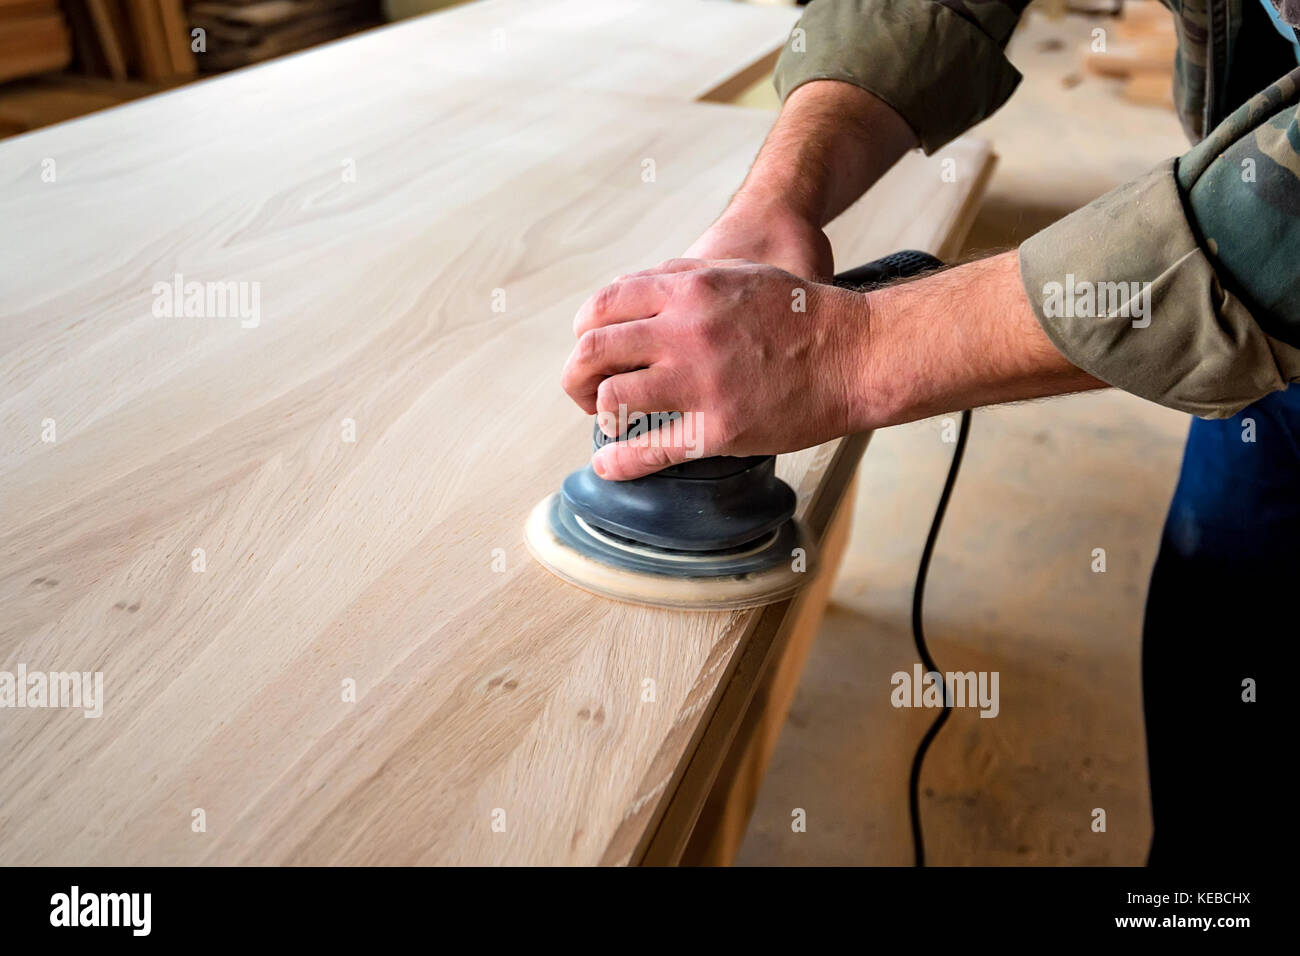 Man sanding wood with orbital sander in a workshop - Stock Image